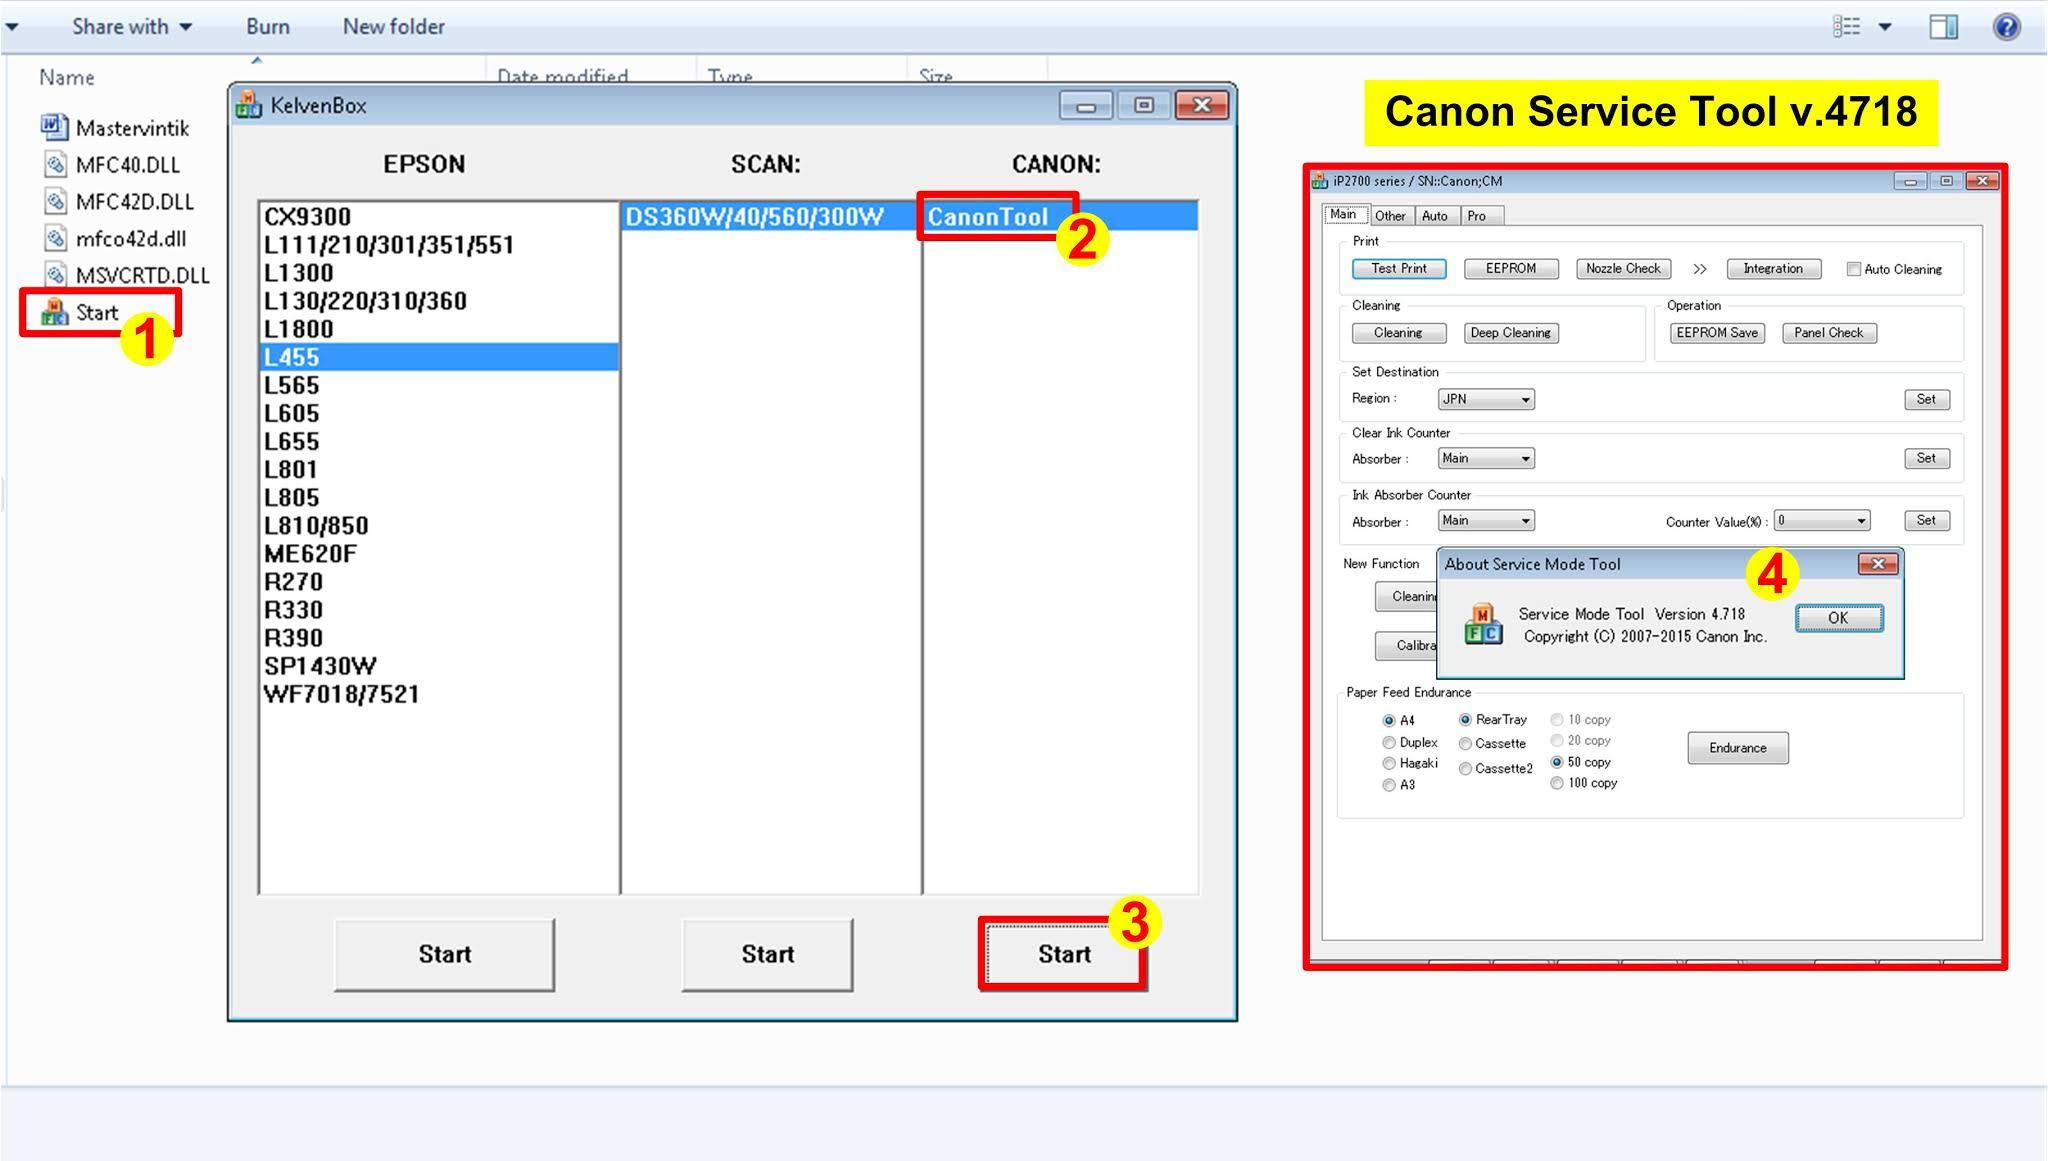 Open Canon Service Tool v.4718